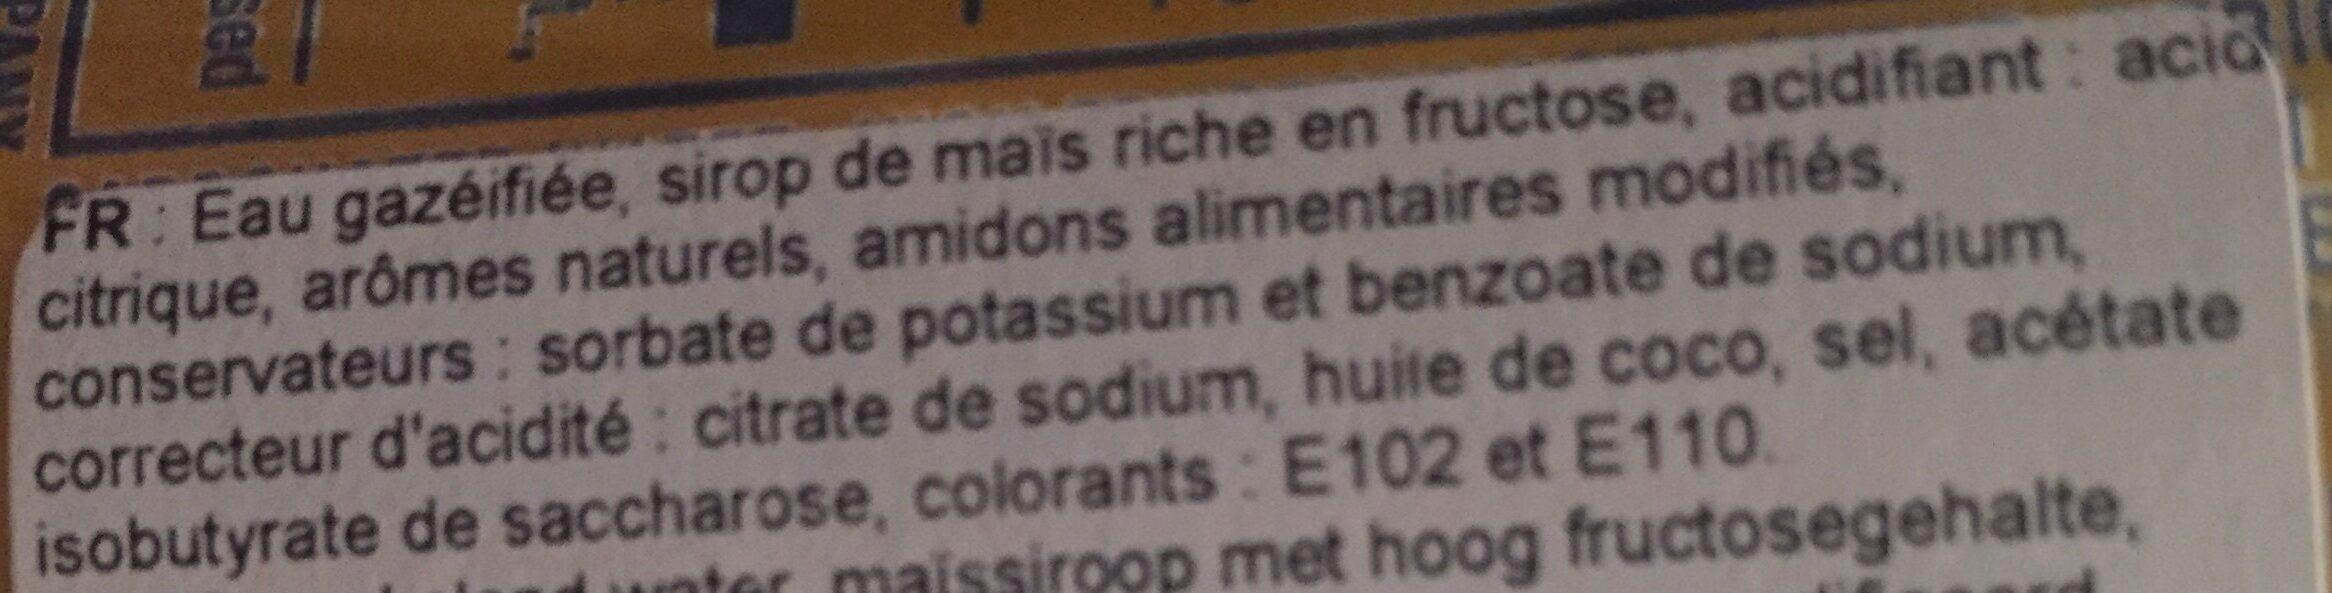 fanta ananas - Ingrédients - fr